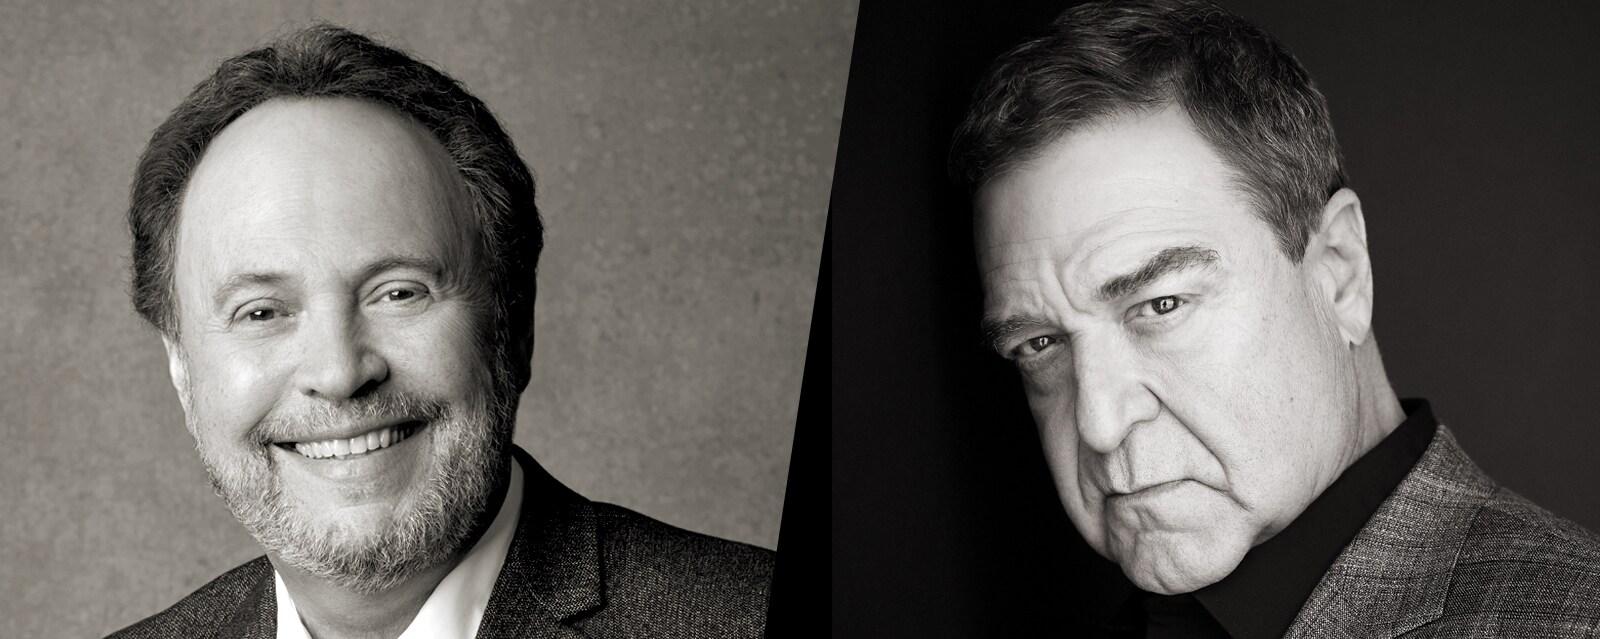 Billy Crystal and John Goodman